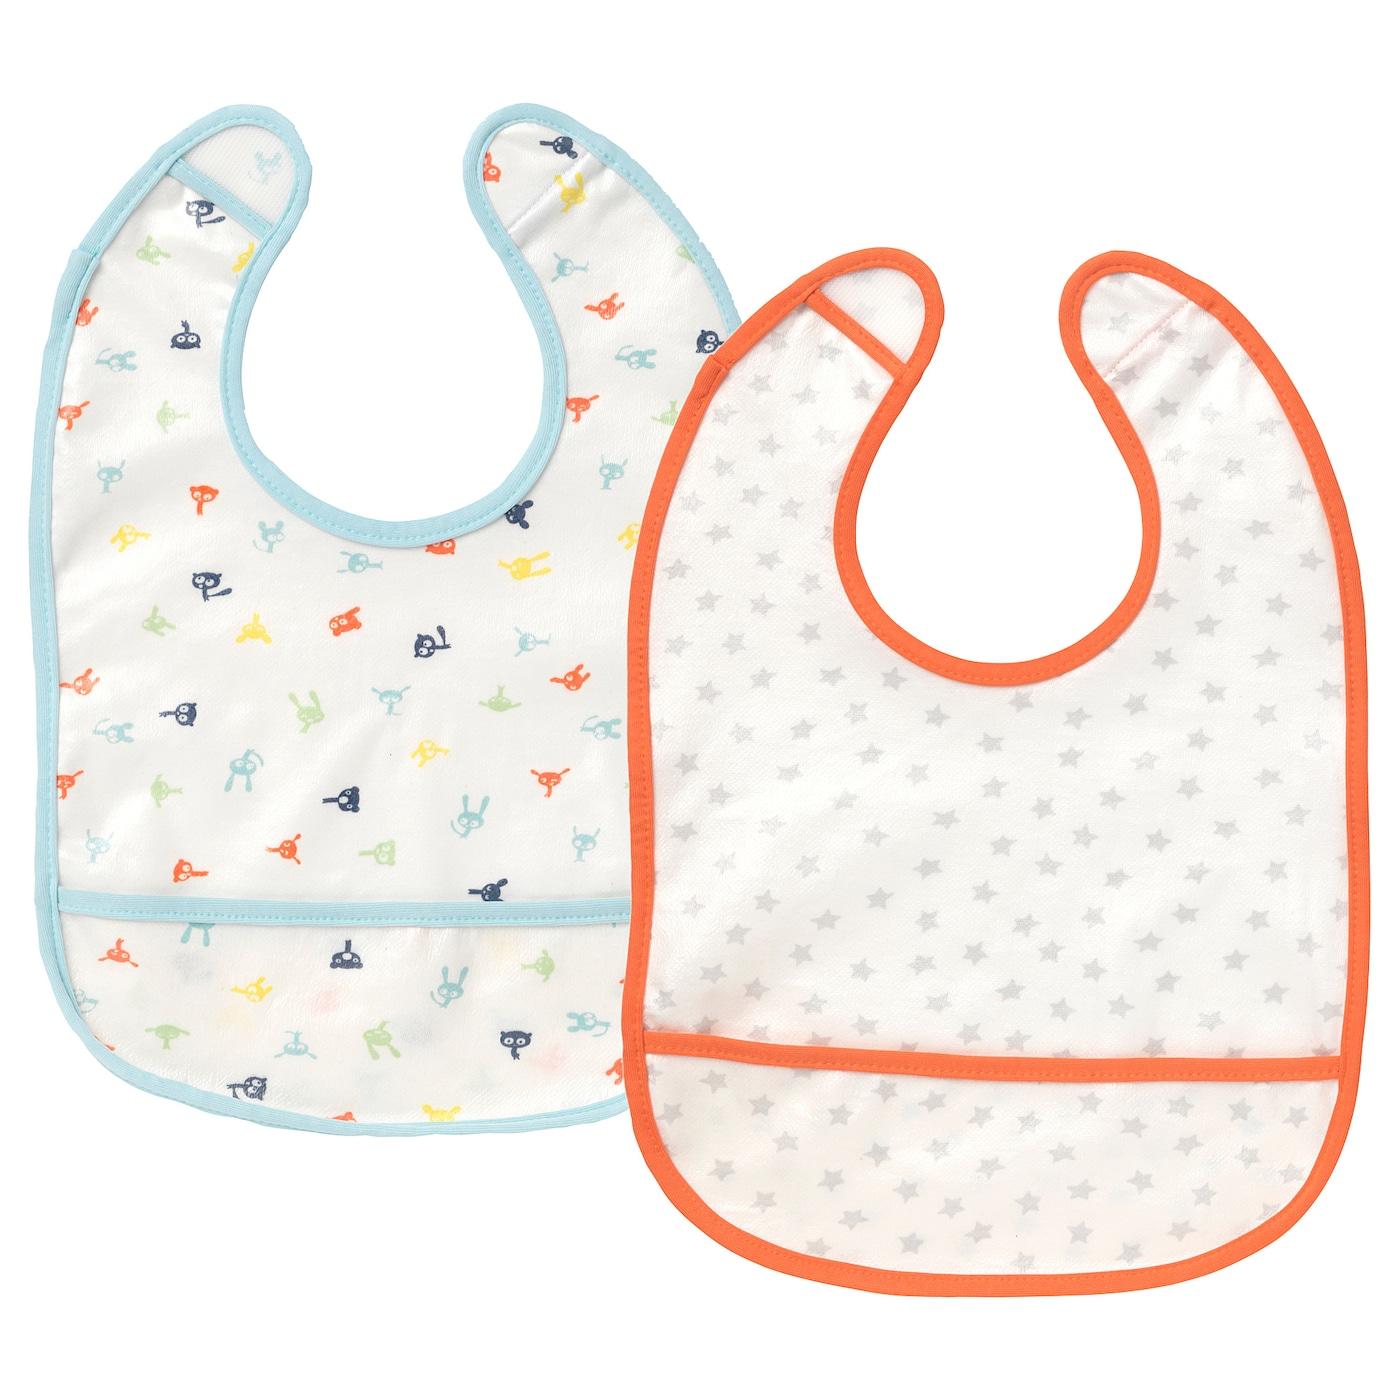 STJÄRNBILD | Kinderzimmer > Textilien für Kinder > Babytextilien | IKEA